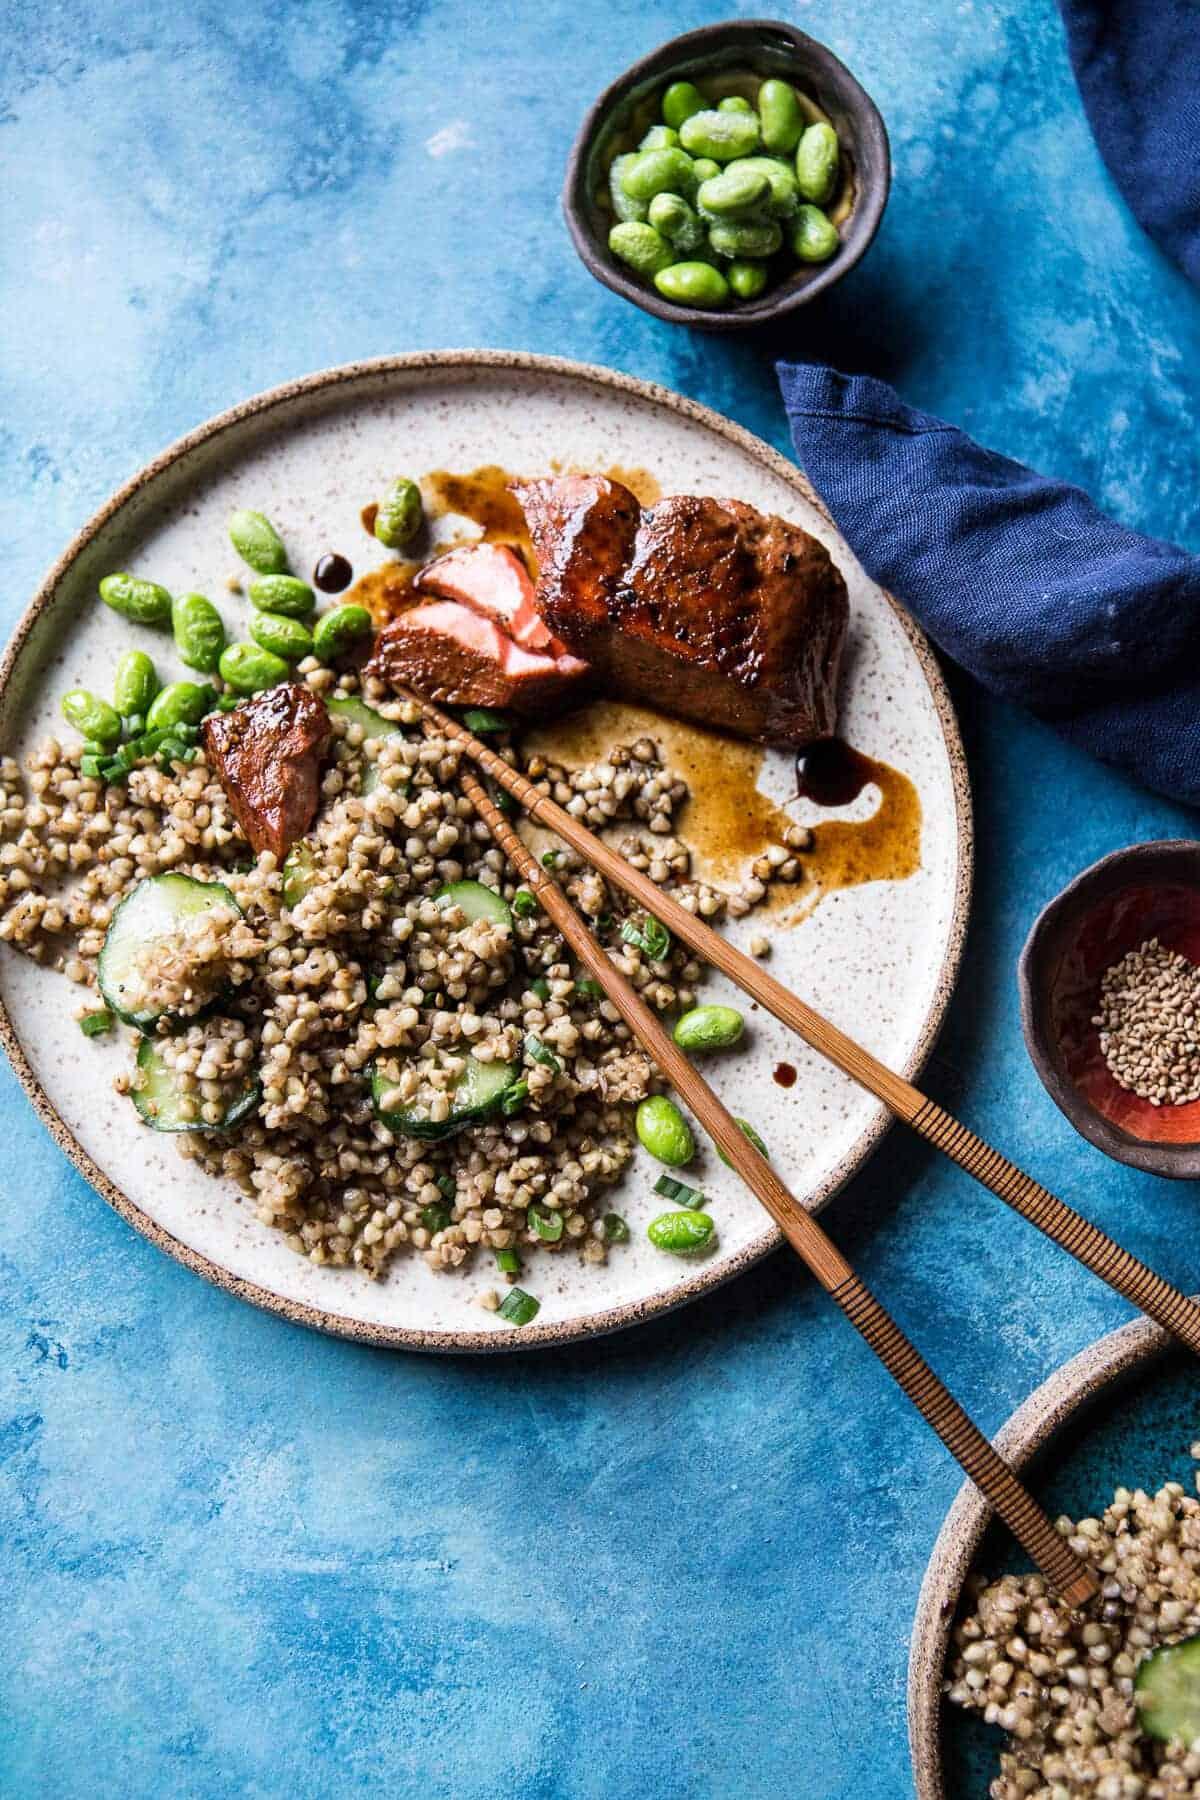 Caramelized Teriyaki Salmon with Sesame Toasted Buckwheat | halfbakedharvest.com @hbharvest